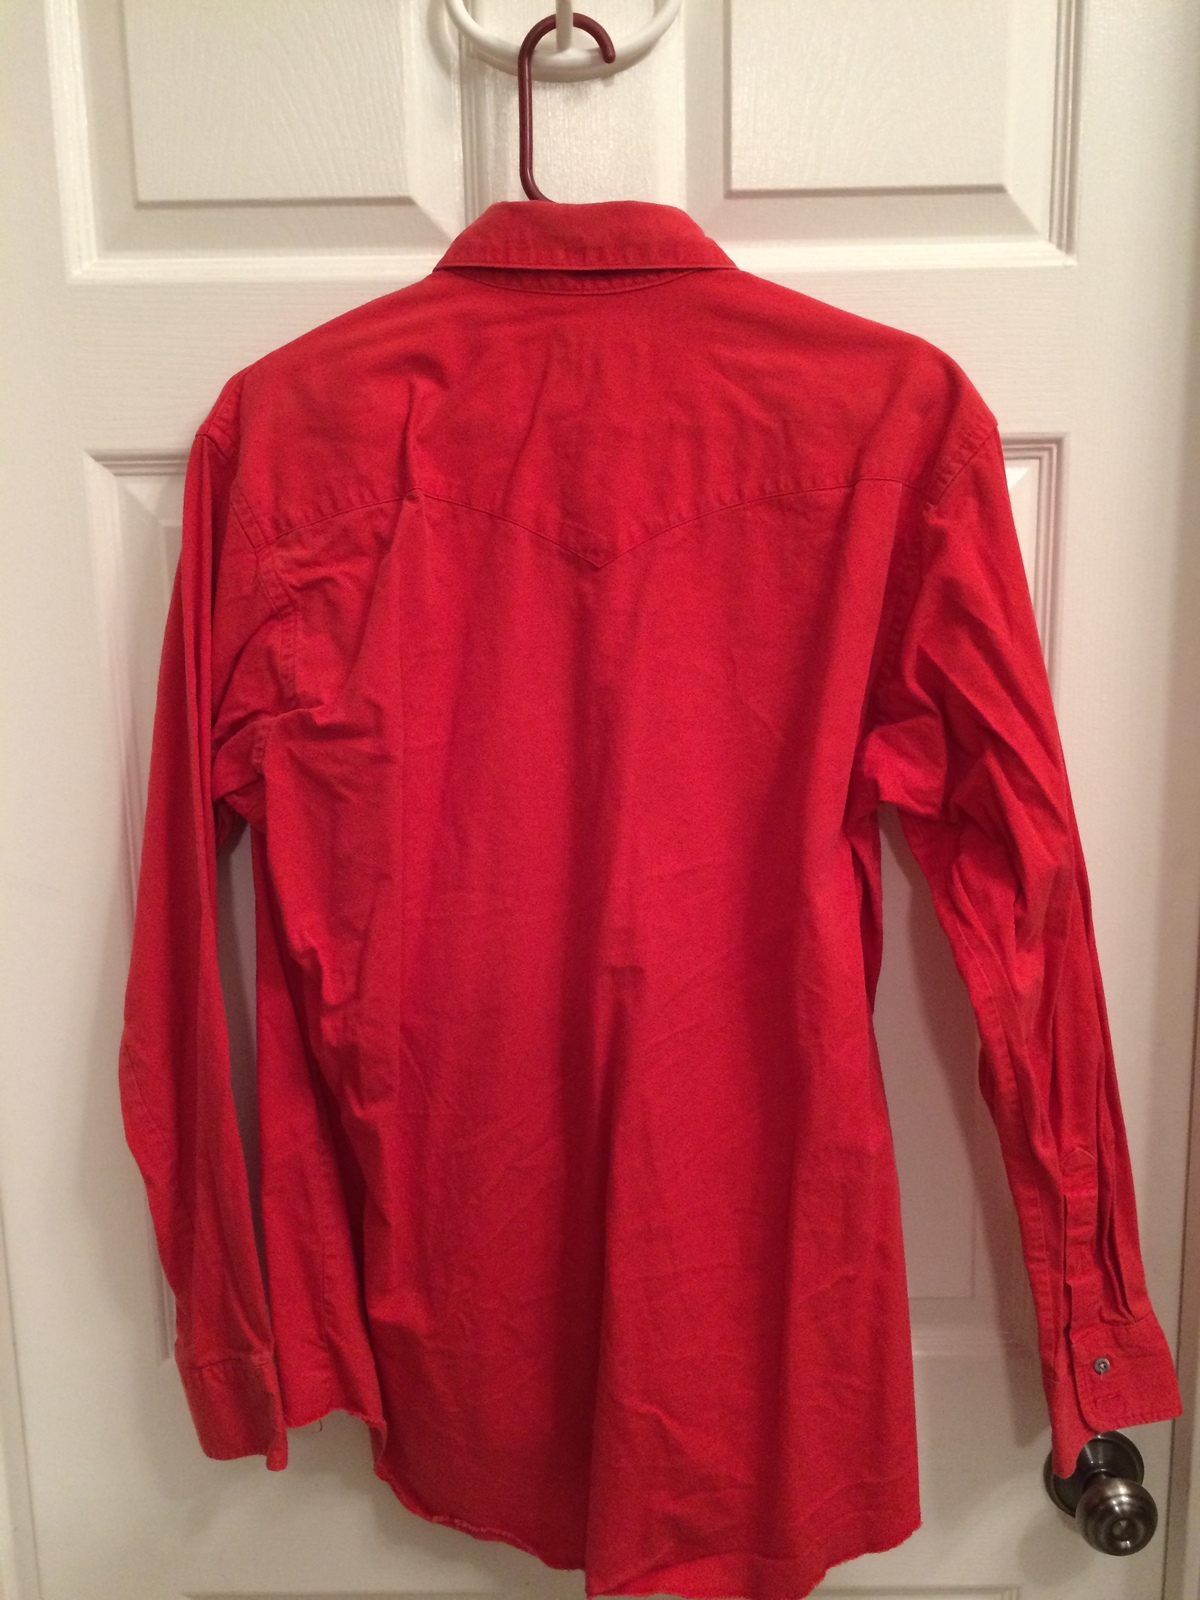 Vintage wrangler western cowboy long sleeved shirt men 39 s large red button up dress shirts for Mens red button up dress shirt